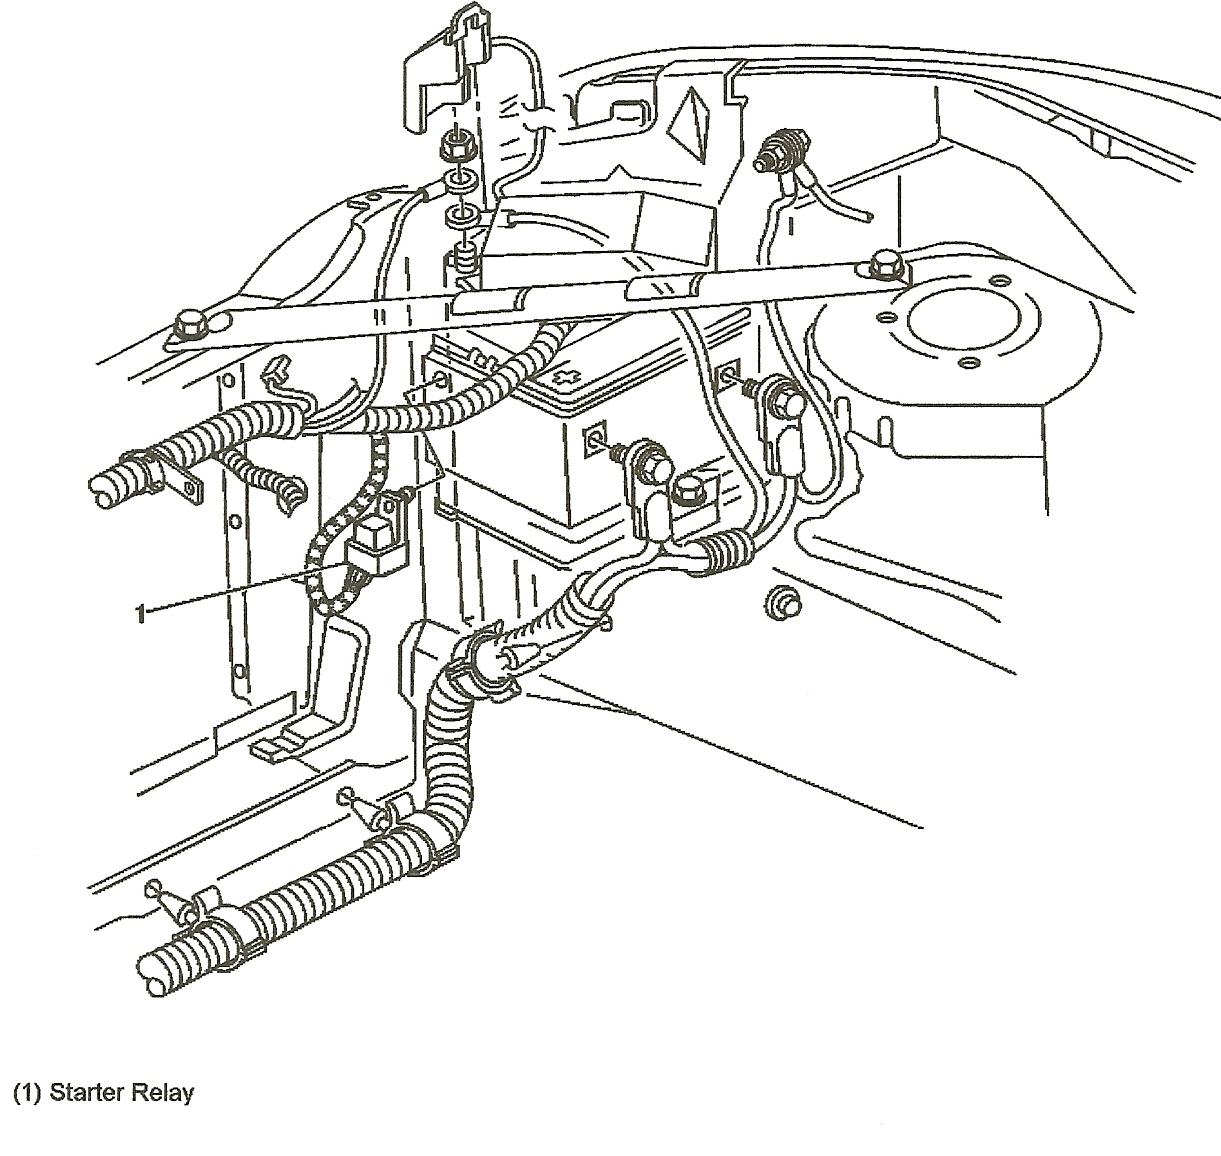 [EM_1616] 2003 Jaguar X Type V6 Engine Diagram Schematic